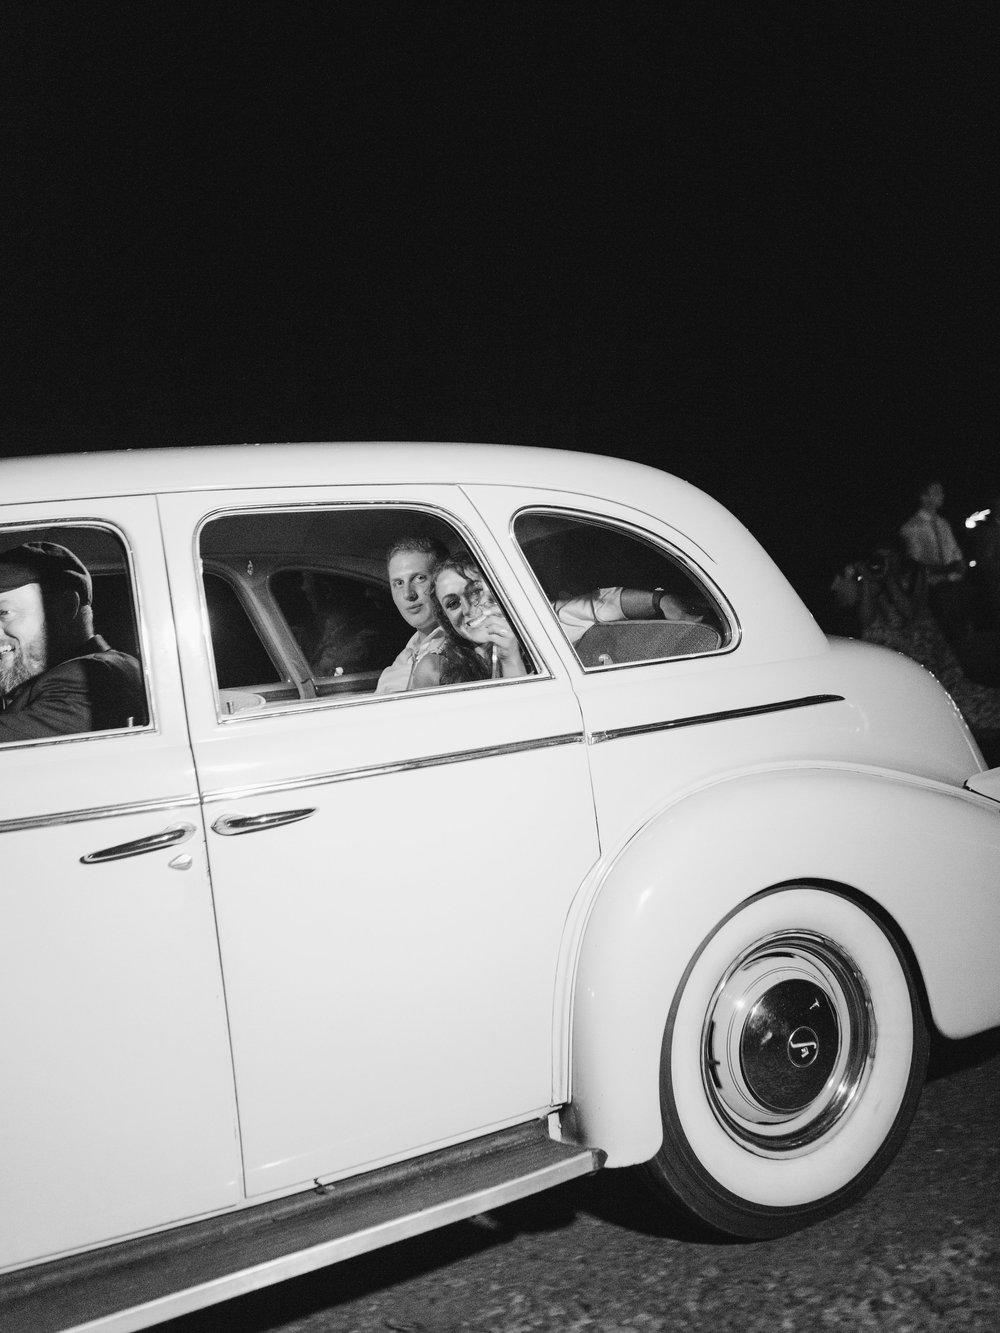 jessica-zimmerman-events-arkansas-wedding-exit-vehicle.jpg